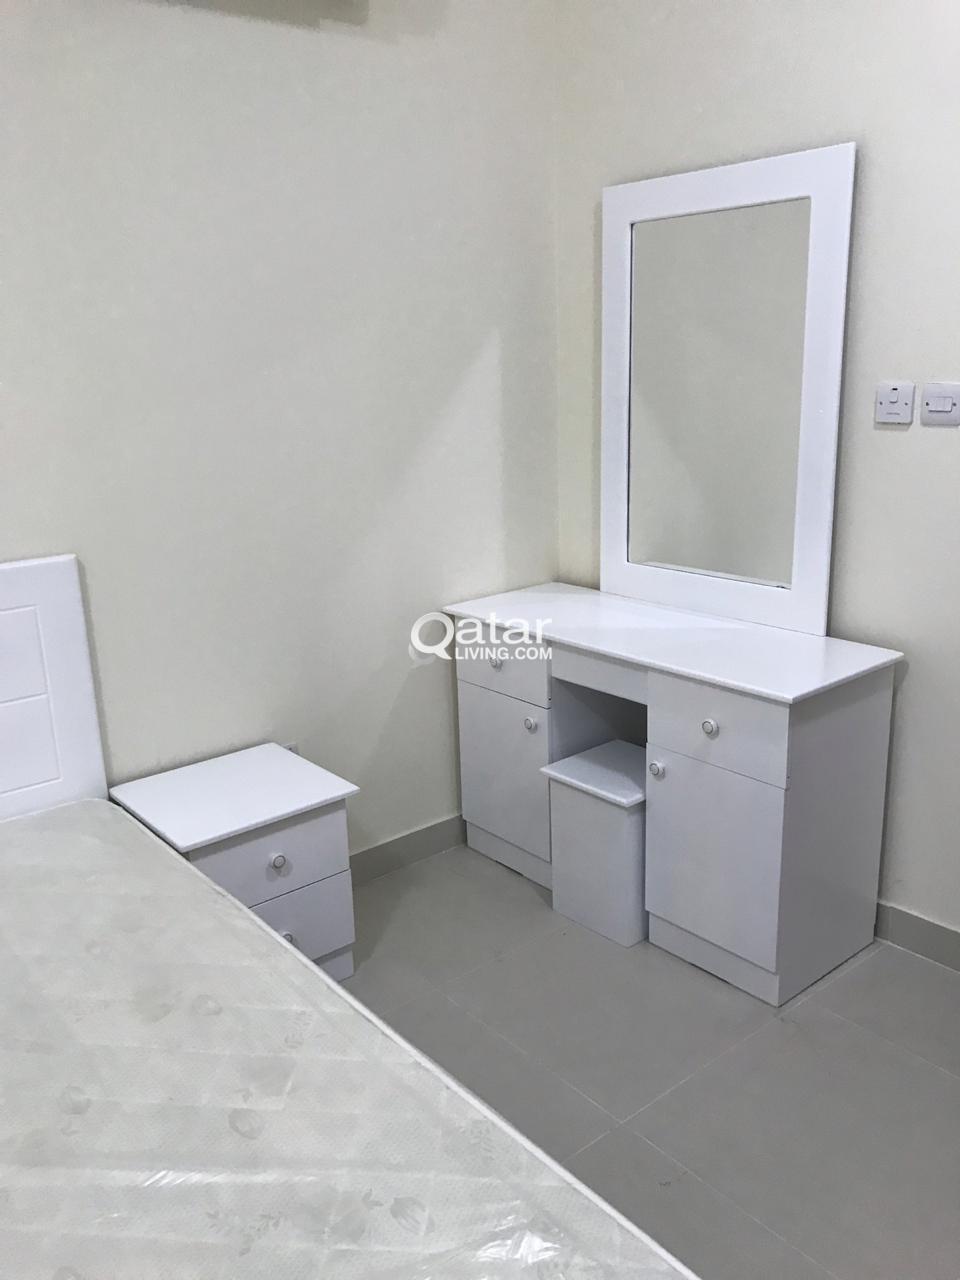 Brand New Furniture Wholesale price